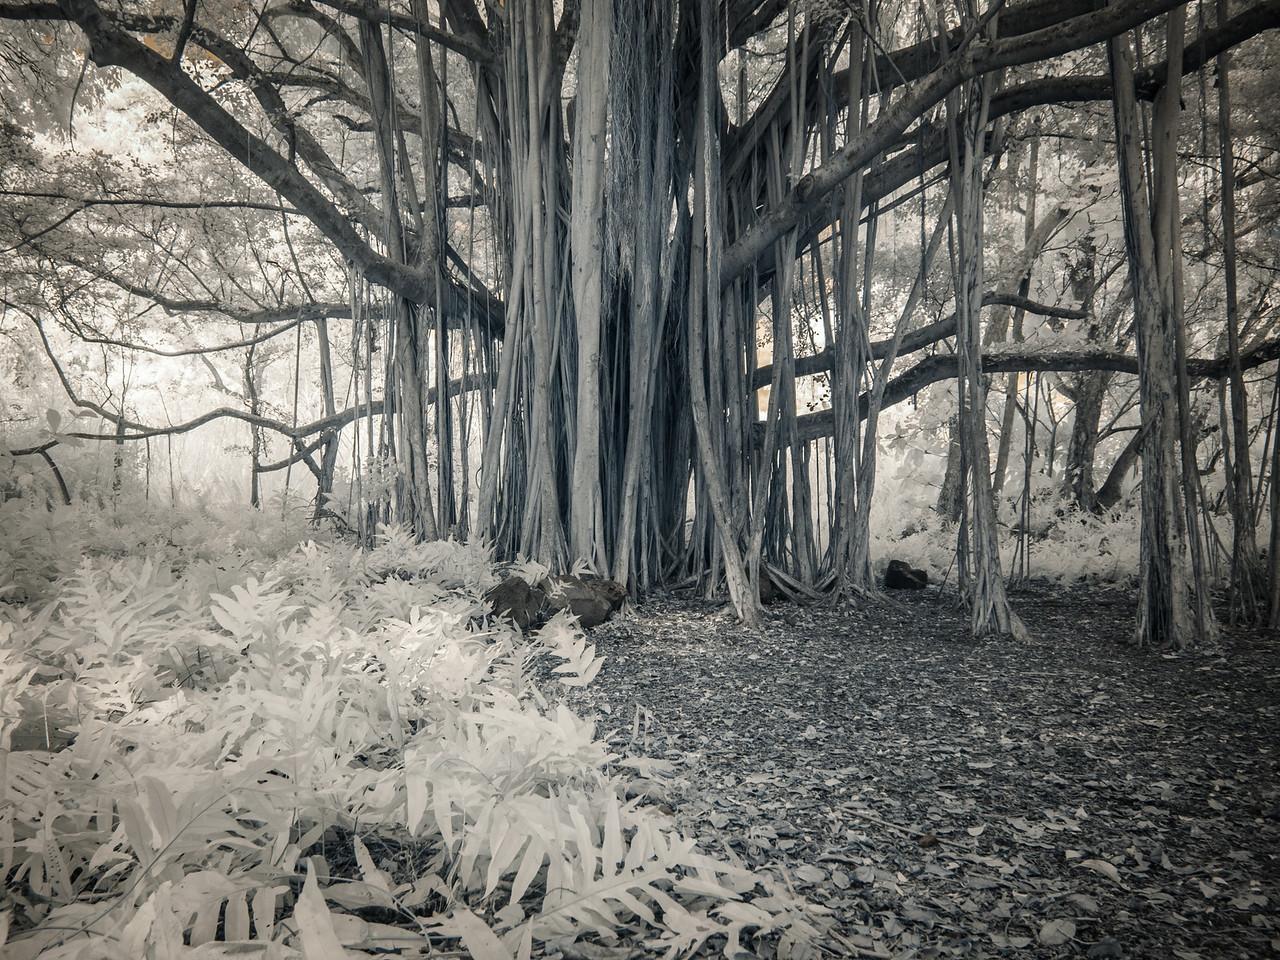 Banyan Tree, Maui